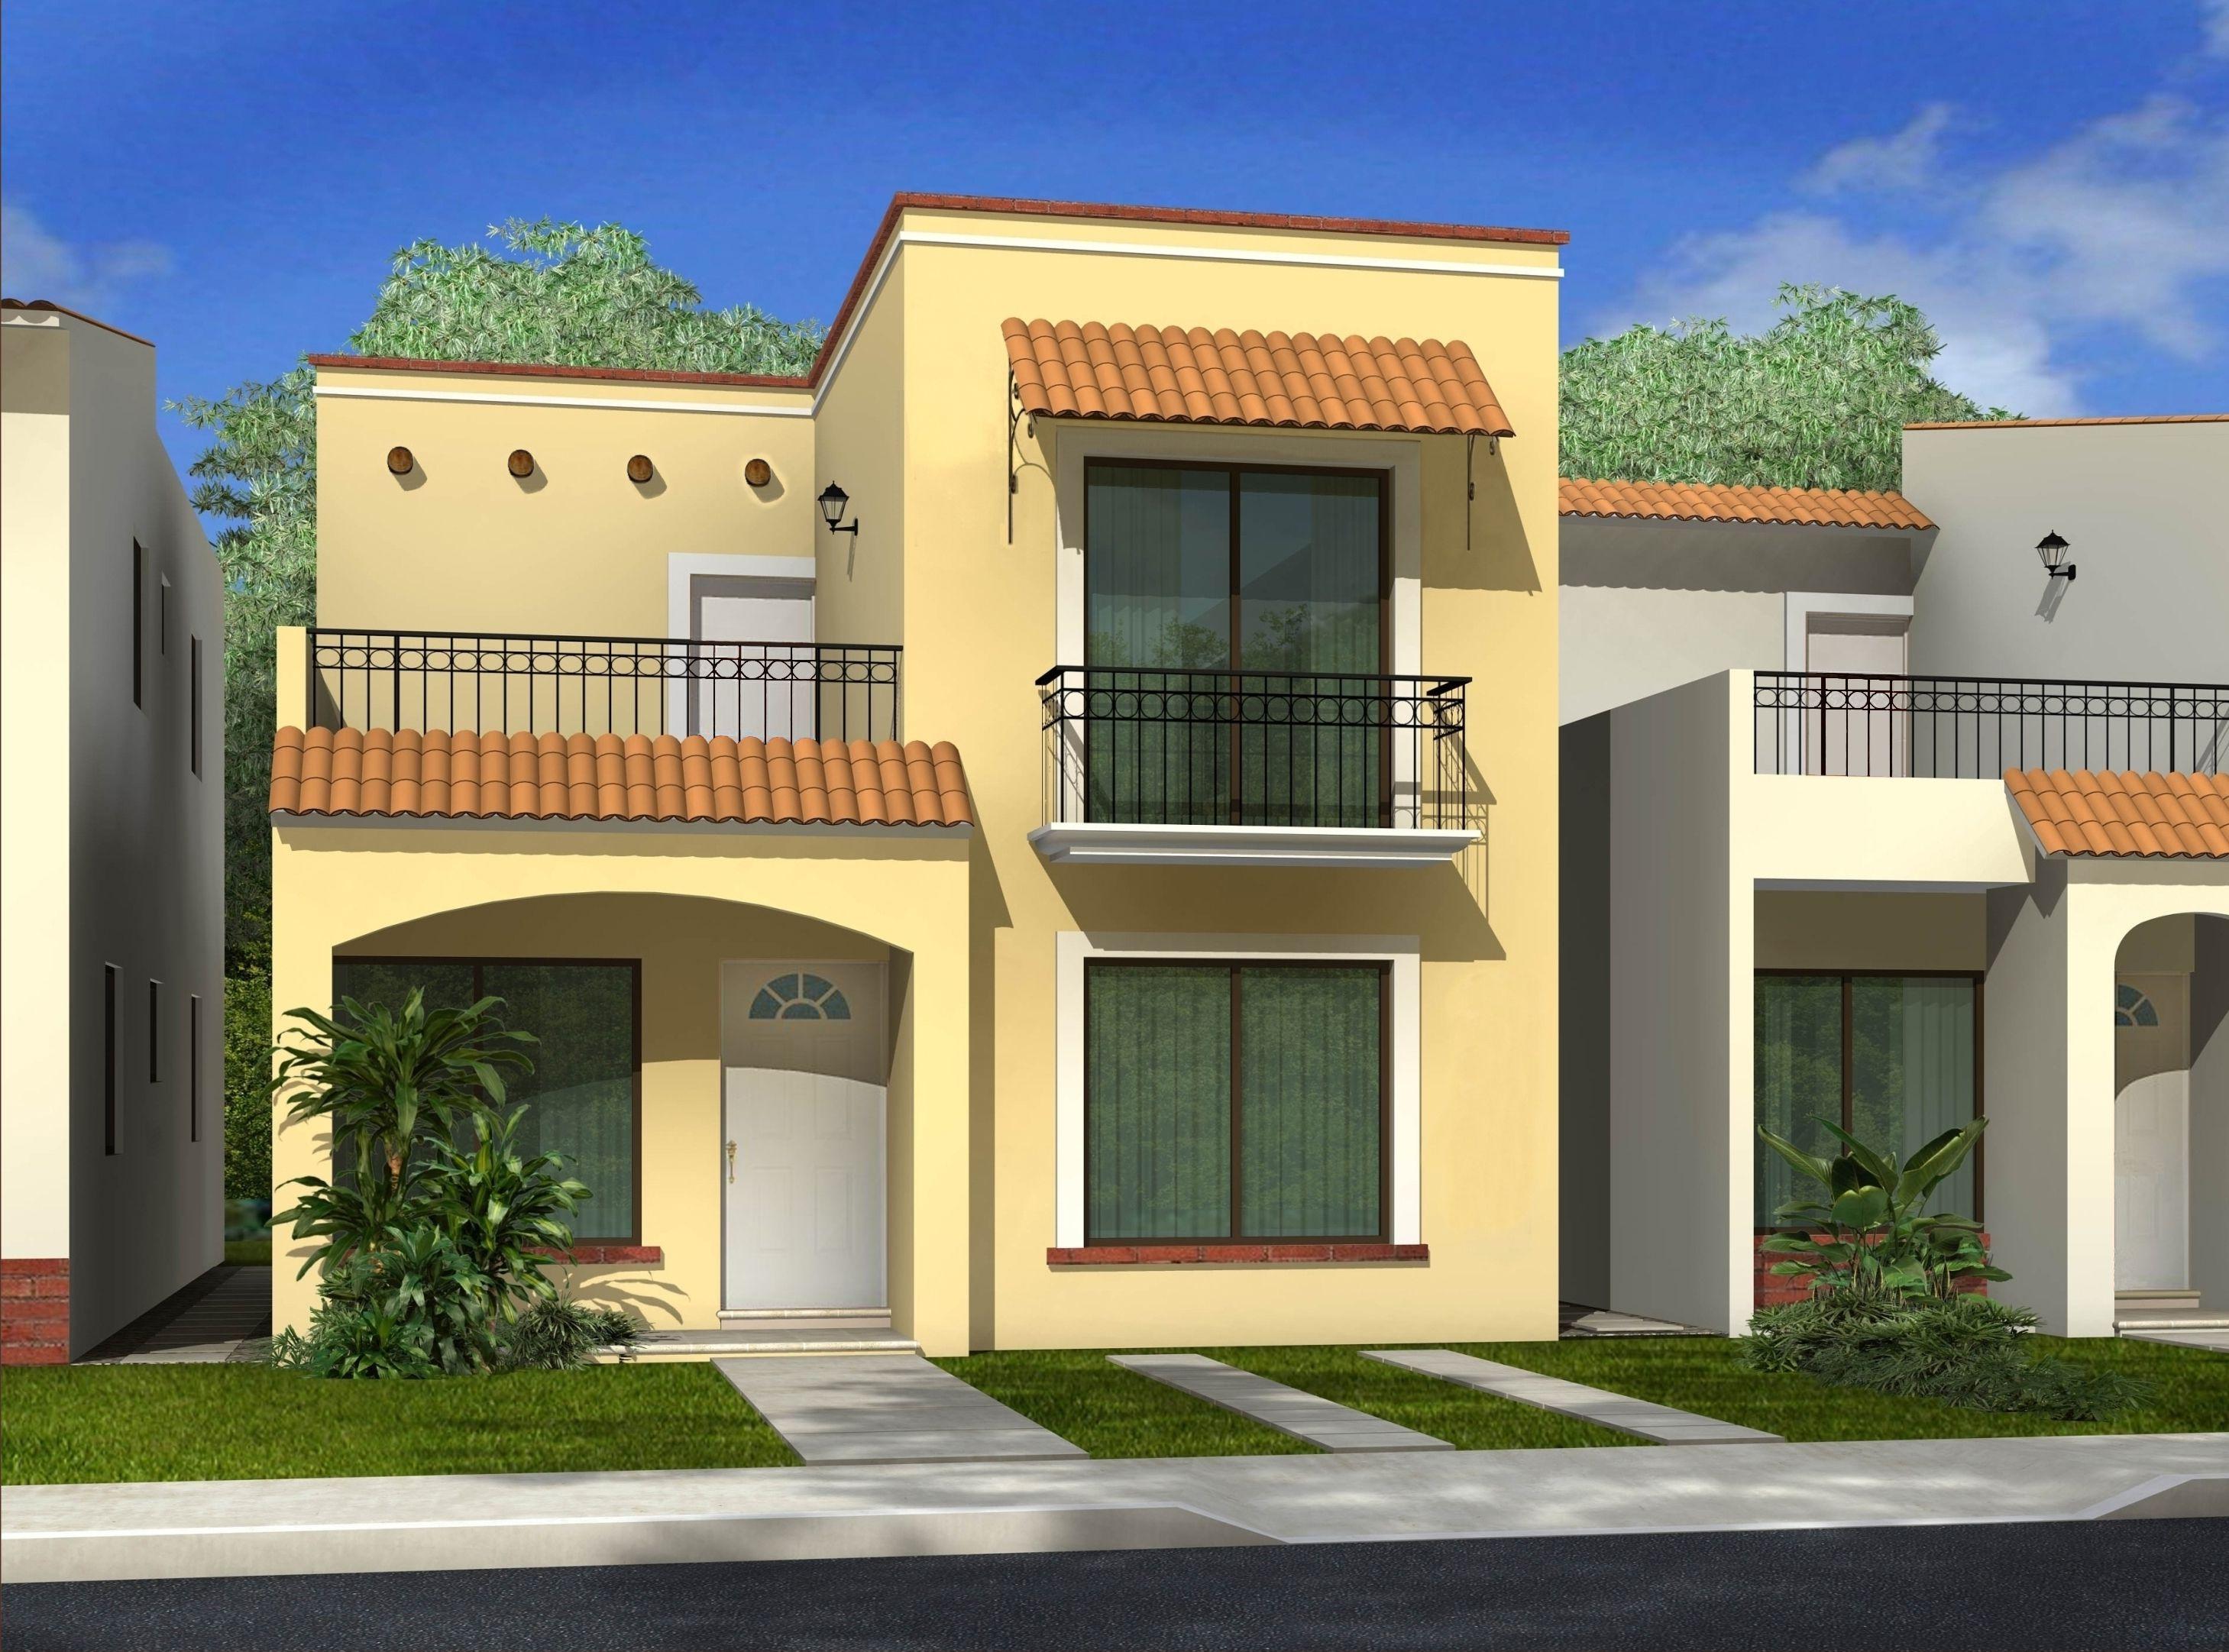 Fachadas Bonitas Y Sencillas Lindo Small House Architecture Two Story House Design Small House Design Plans